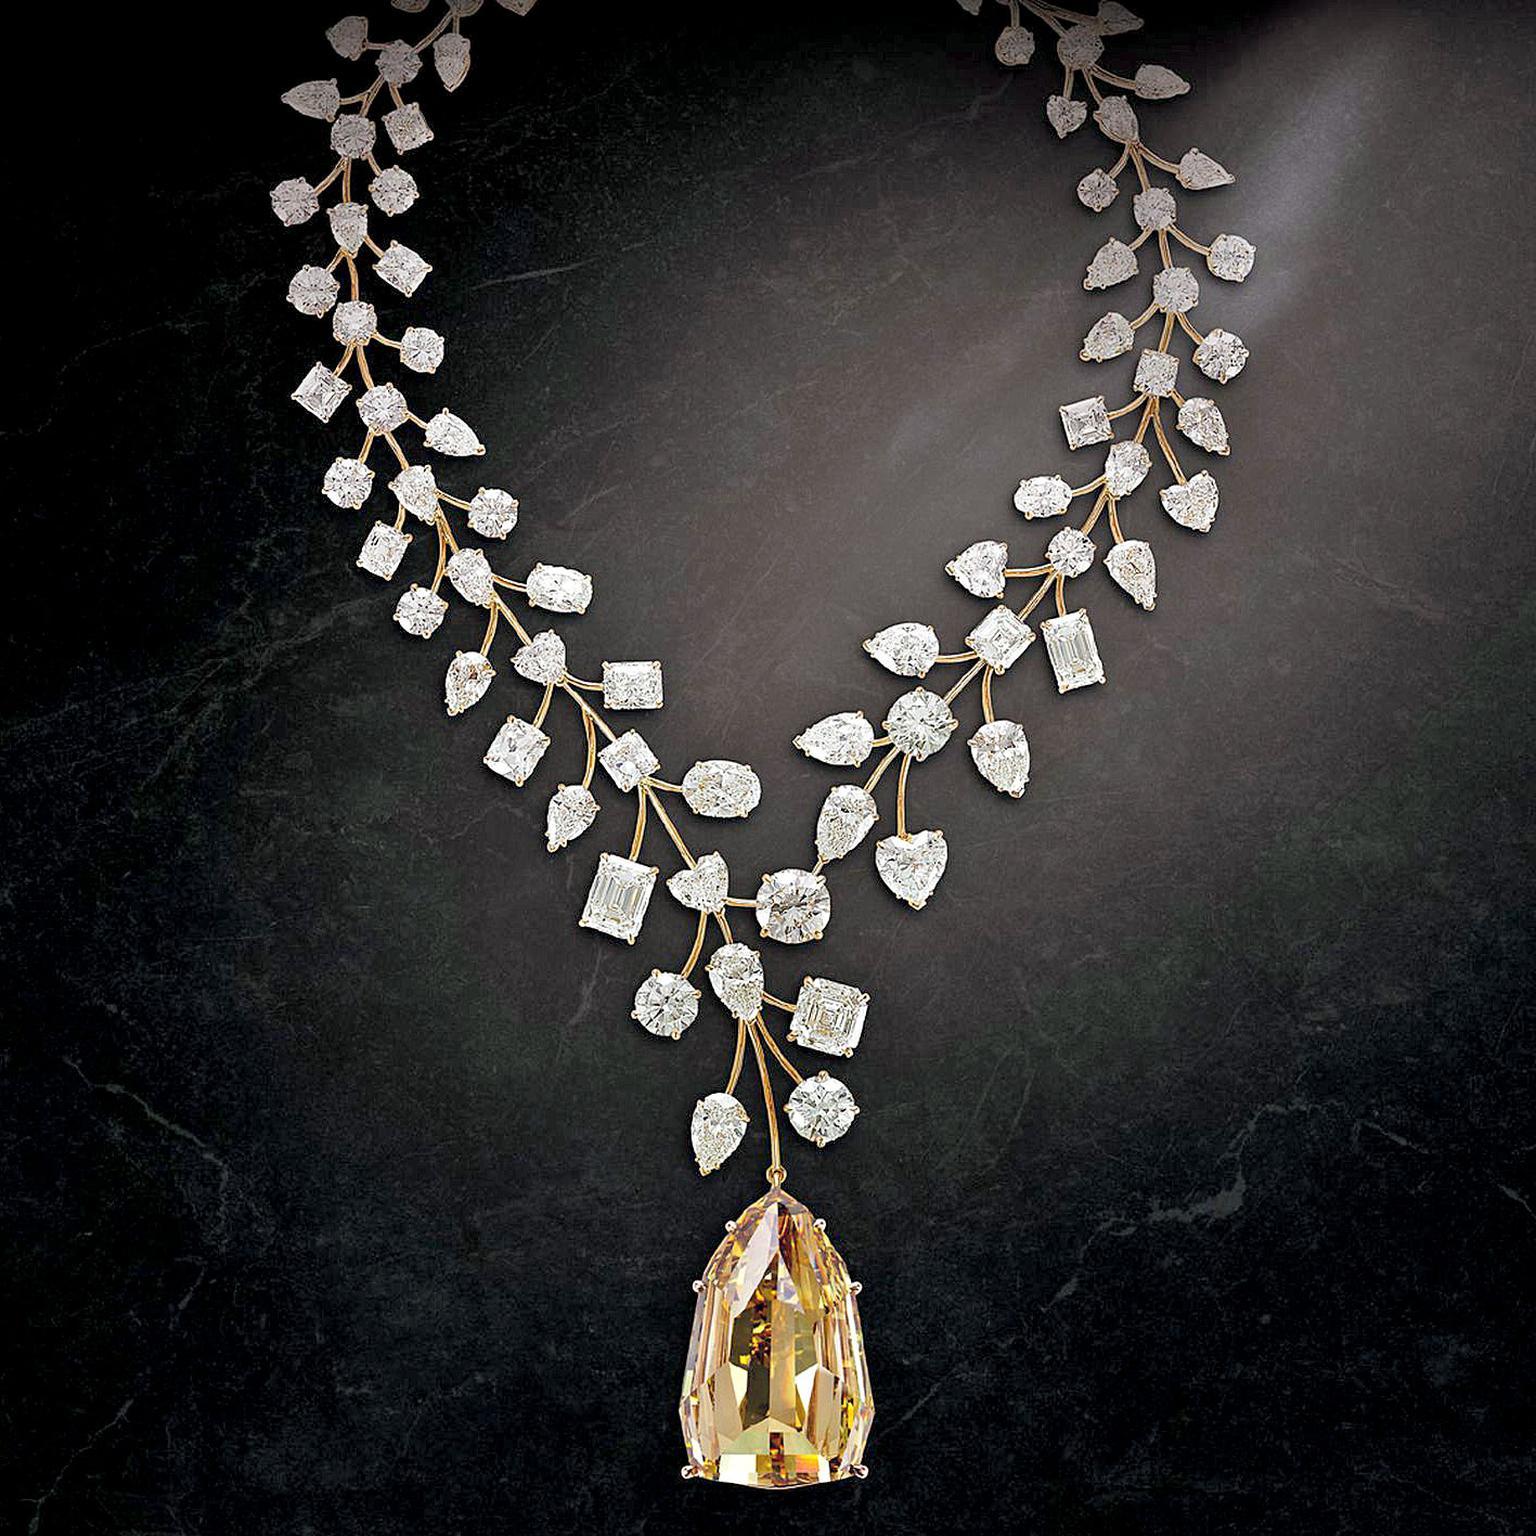 l'Incomparable Diamond Necklace - £45 Million